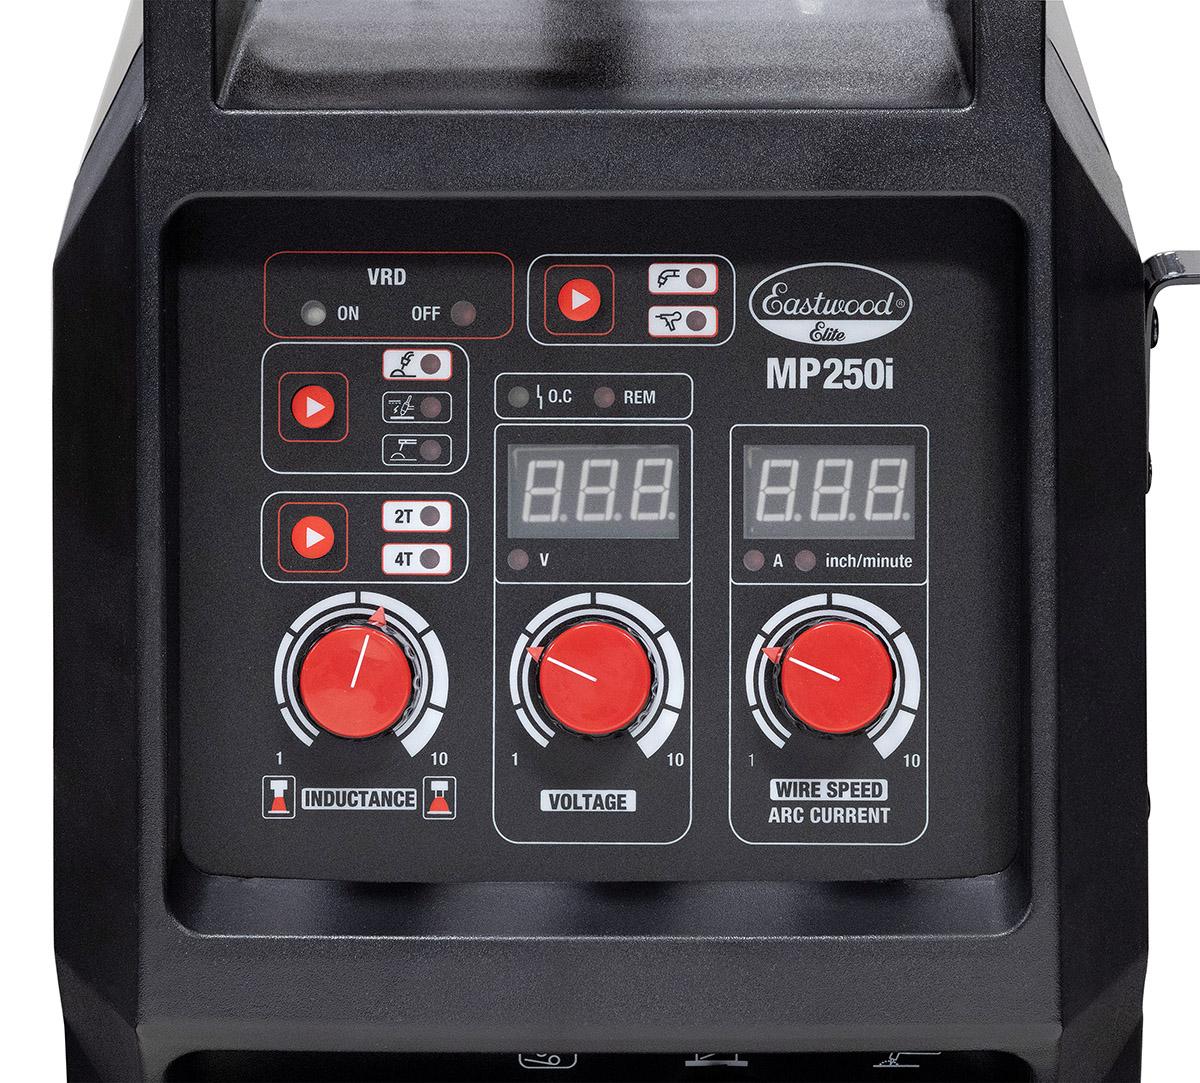 Eastwood MP250i Welder